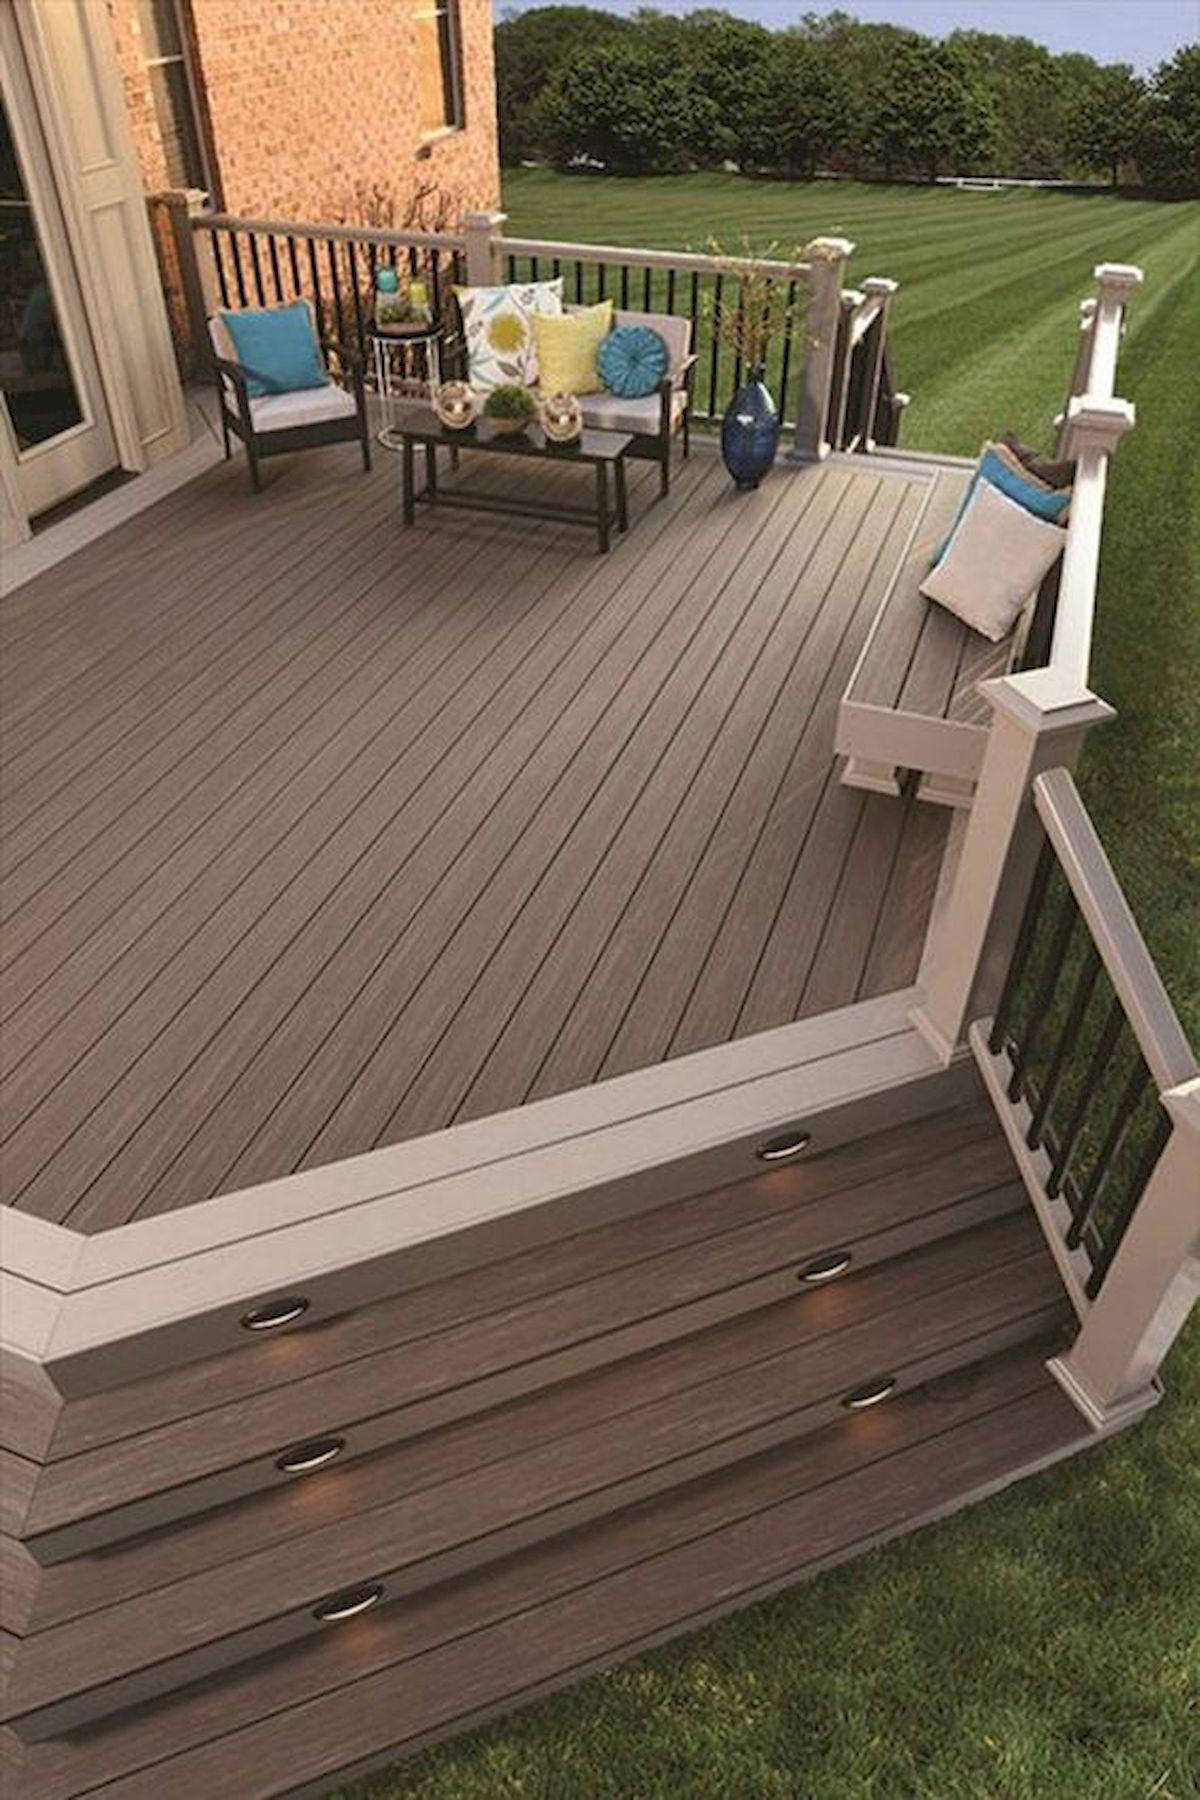 50 Fantastic Backyard Patio and Decking Design Ideas (15)